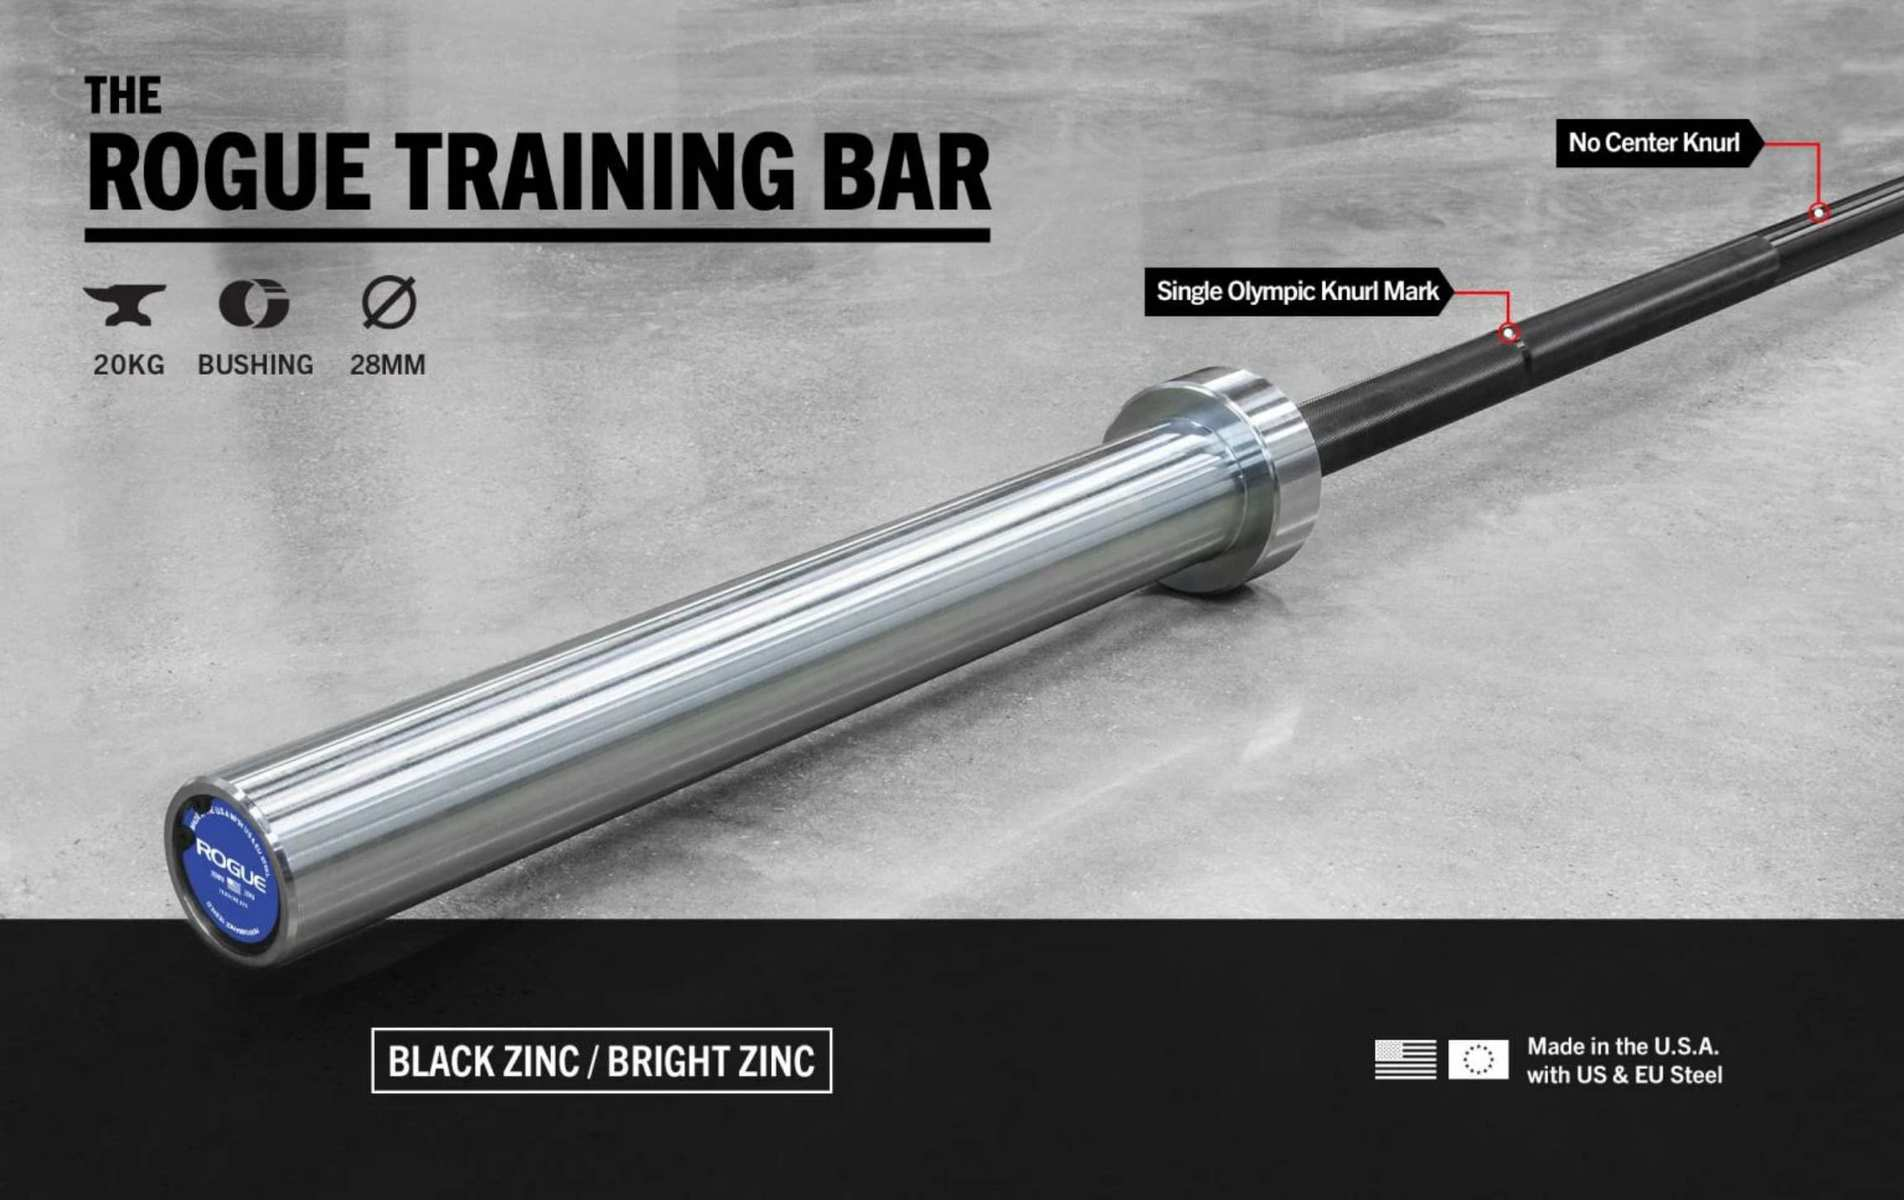 Rogue 28MM Training Bar - Black Zinc